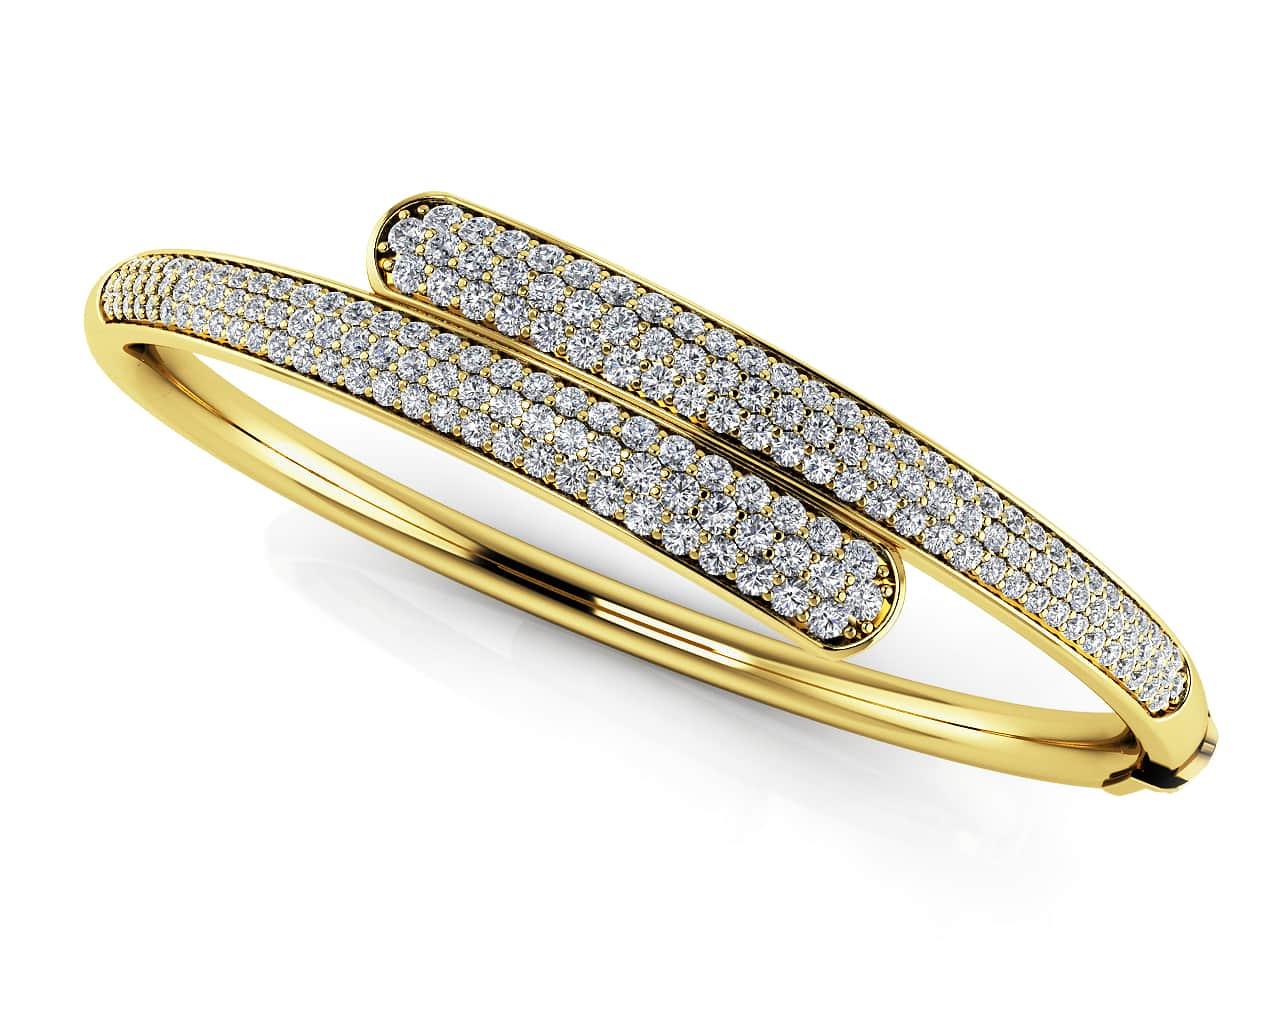 Buy Quality Diamond Bangle Bracelets in Gold or Platinum